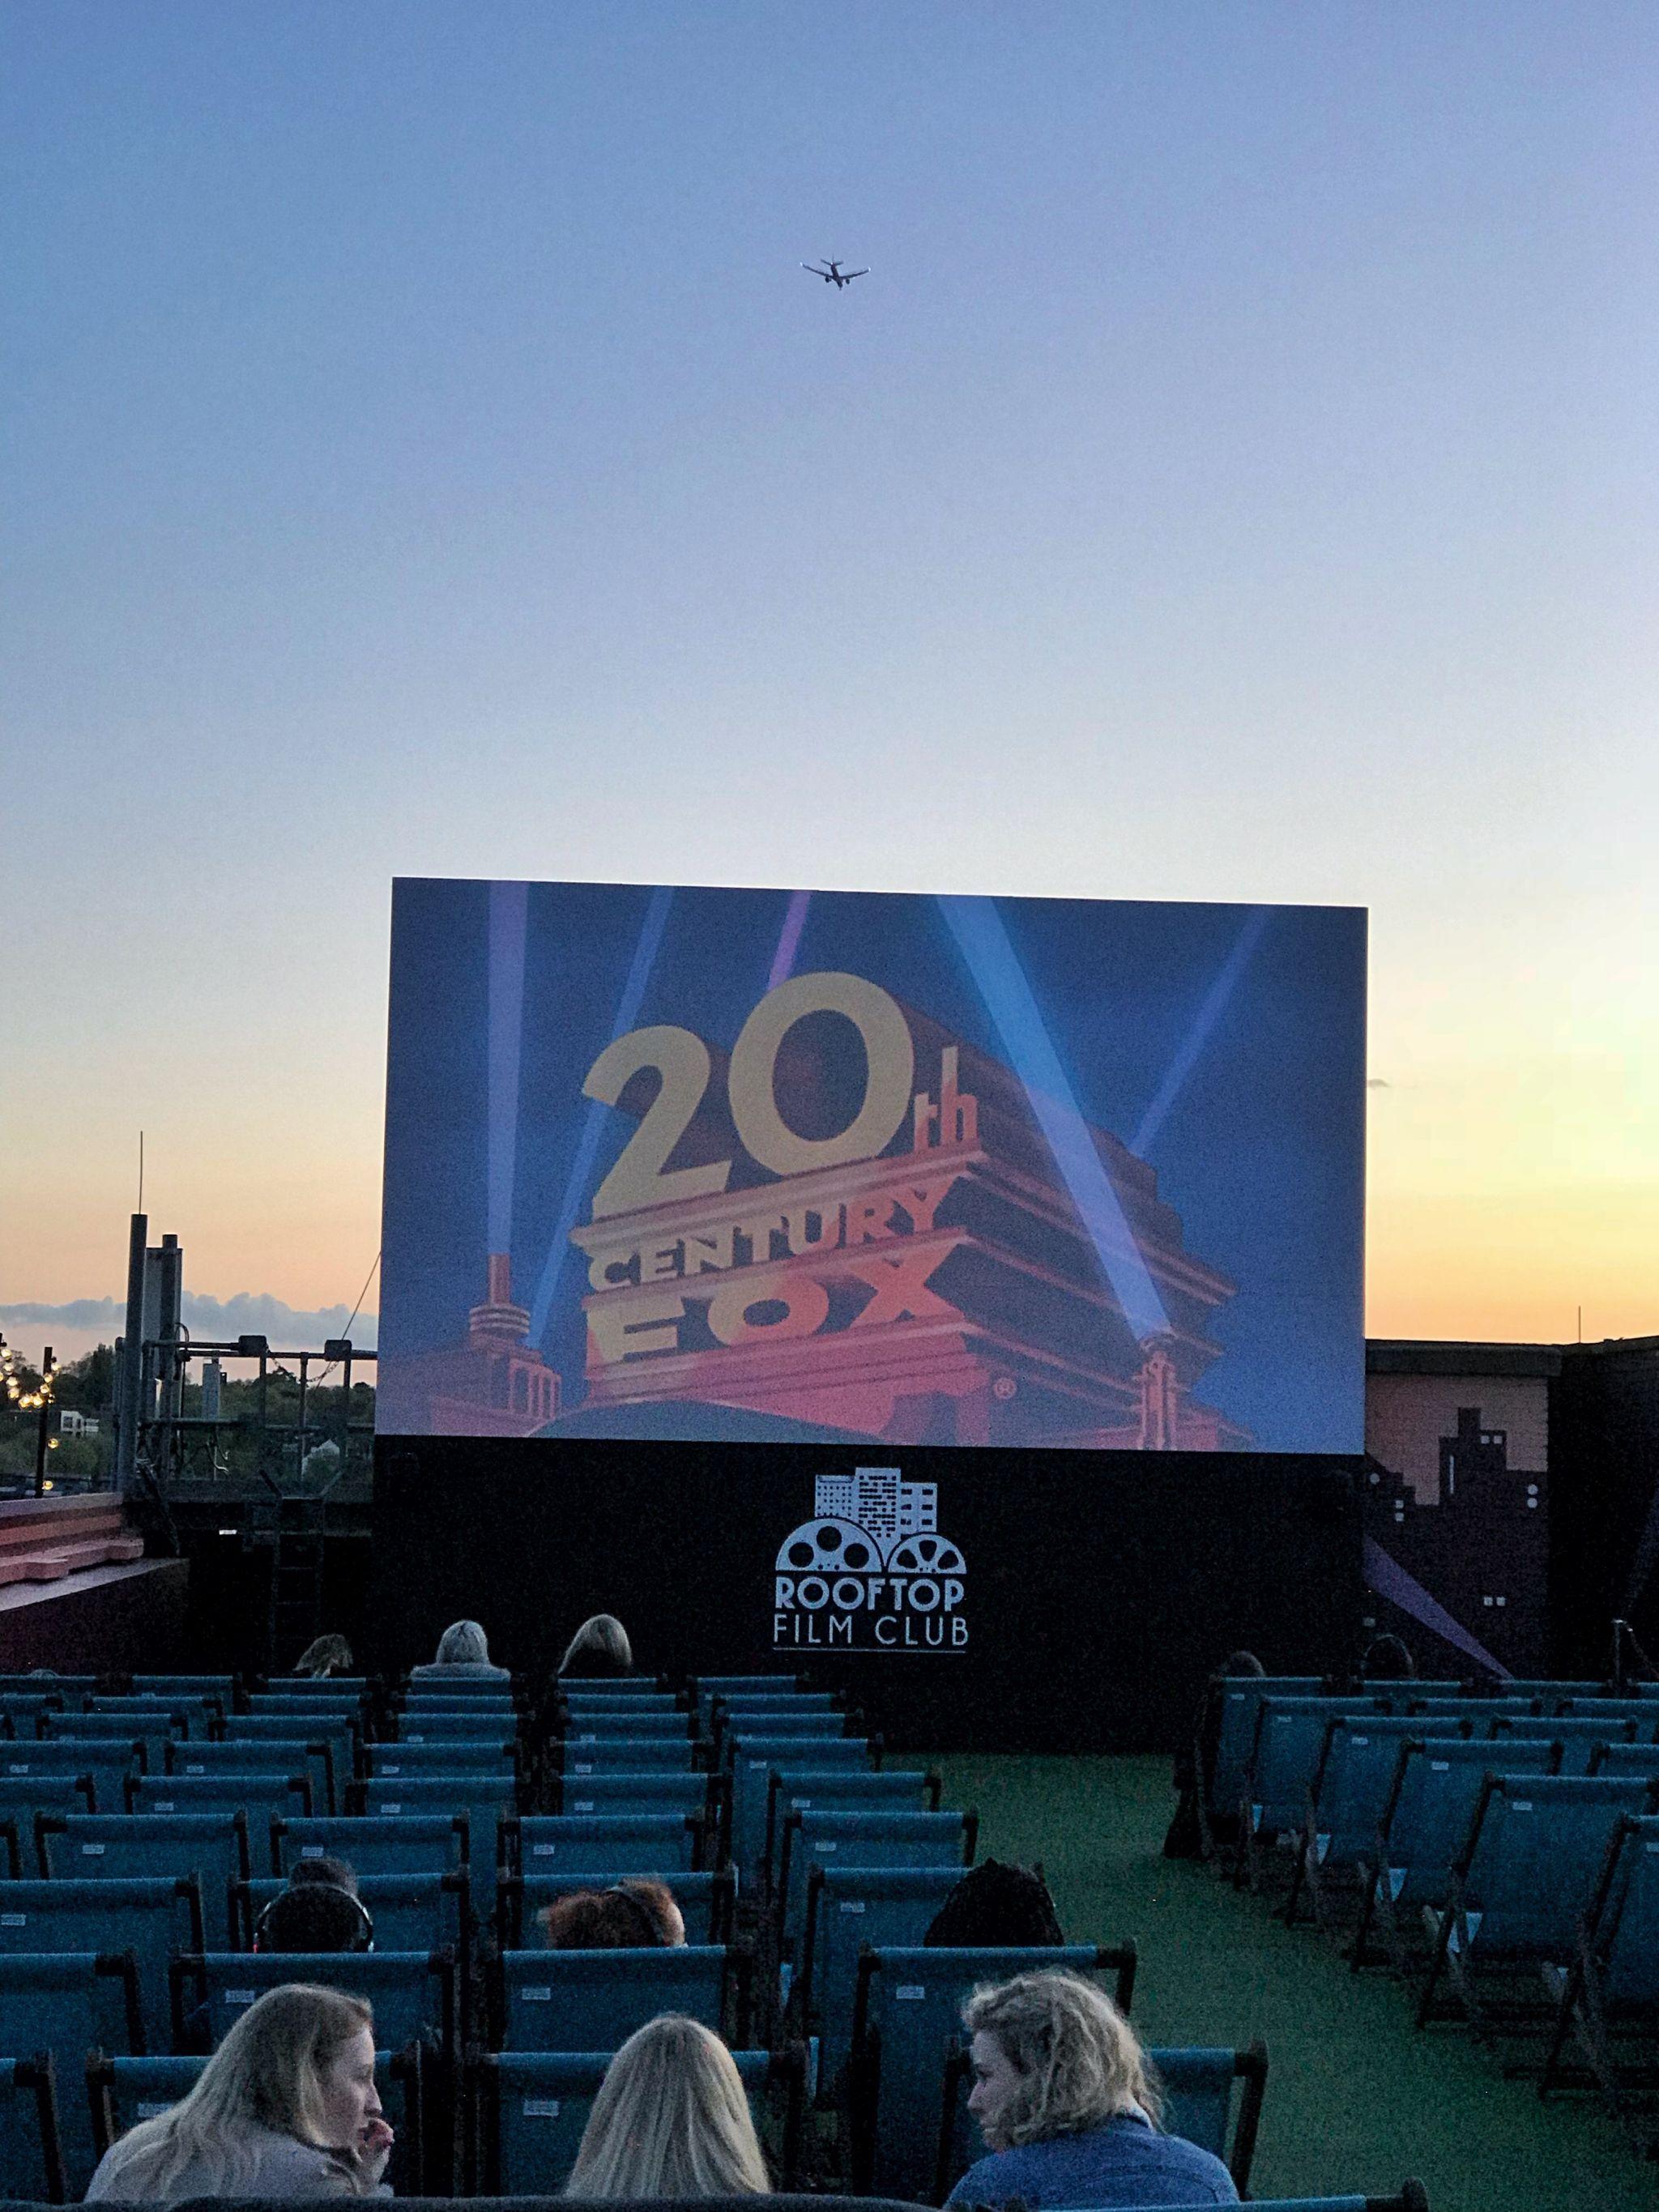 THE PERFECT DATING LOCATION IN LONDON: ROOFTOP CINEMA CLUB - Natasha Atlas